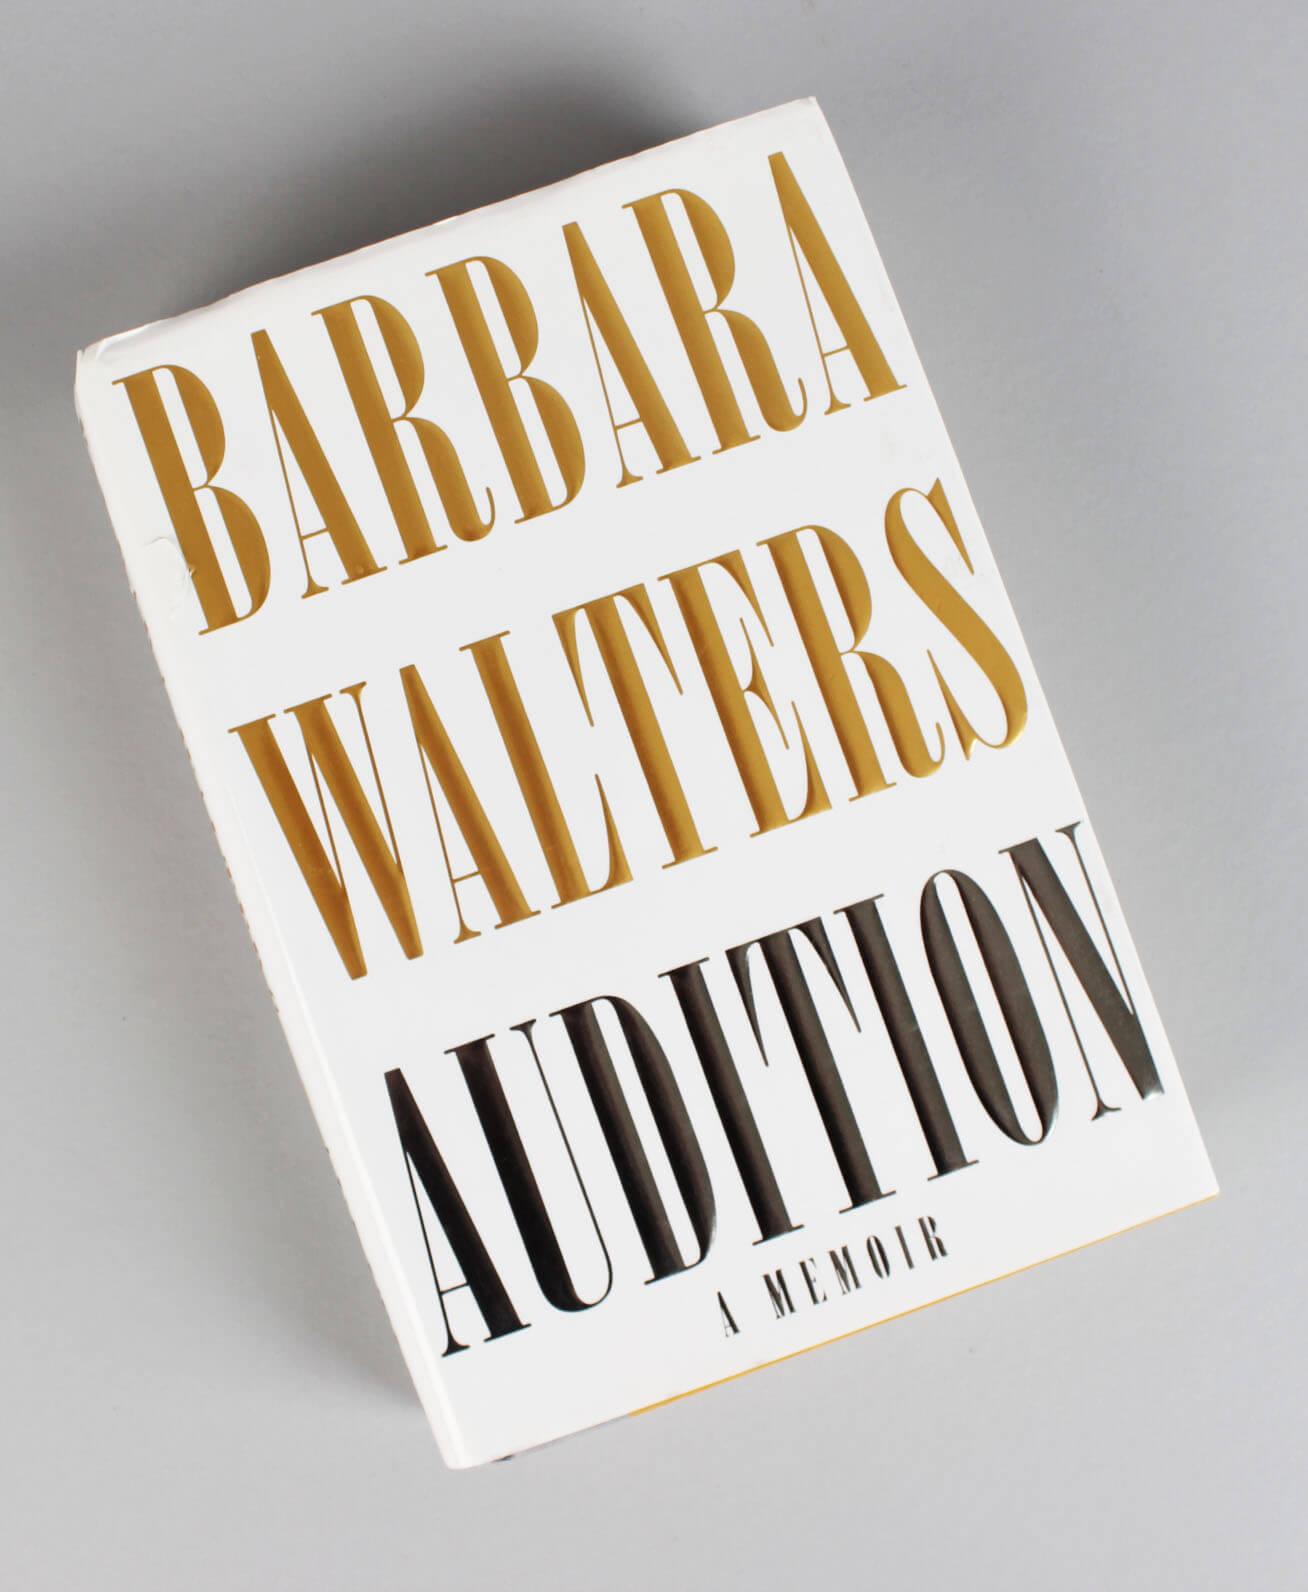 Barbara Walters Signed Audition A Memoir Book (COA)57350_01